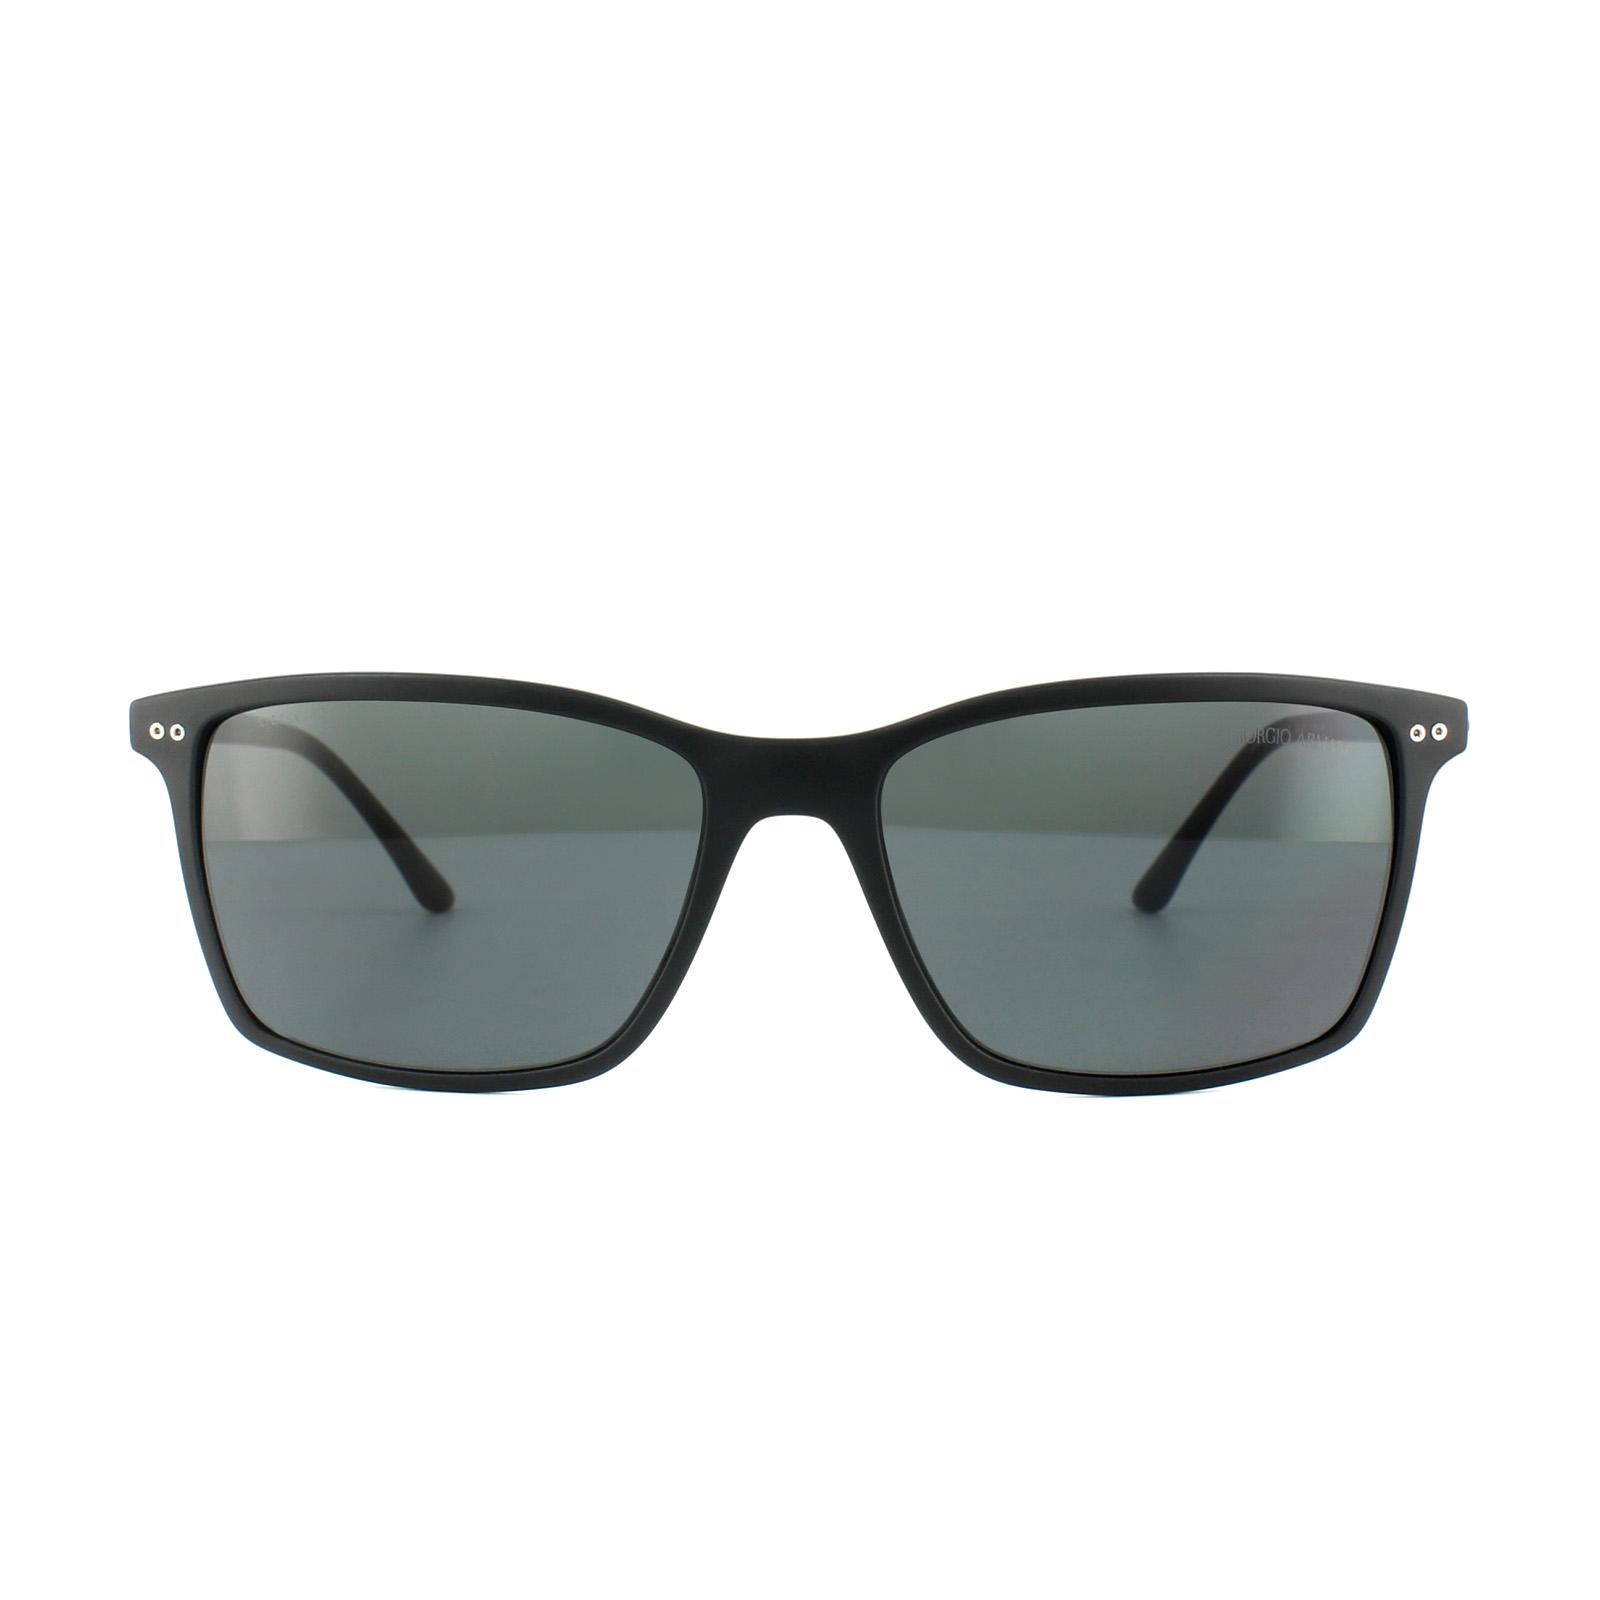 ba3ba2d967dc Sentinel Thumbnail 1. Sentinel Giorgio Armani Sunglasses AR8045 504287 Matt  Black Grey. Sentinel Thumbnail 2